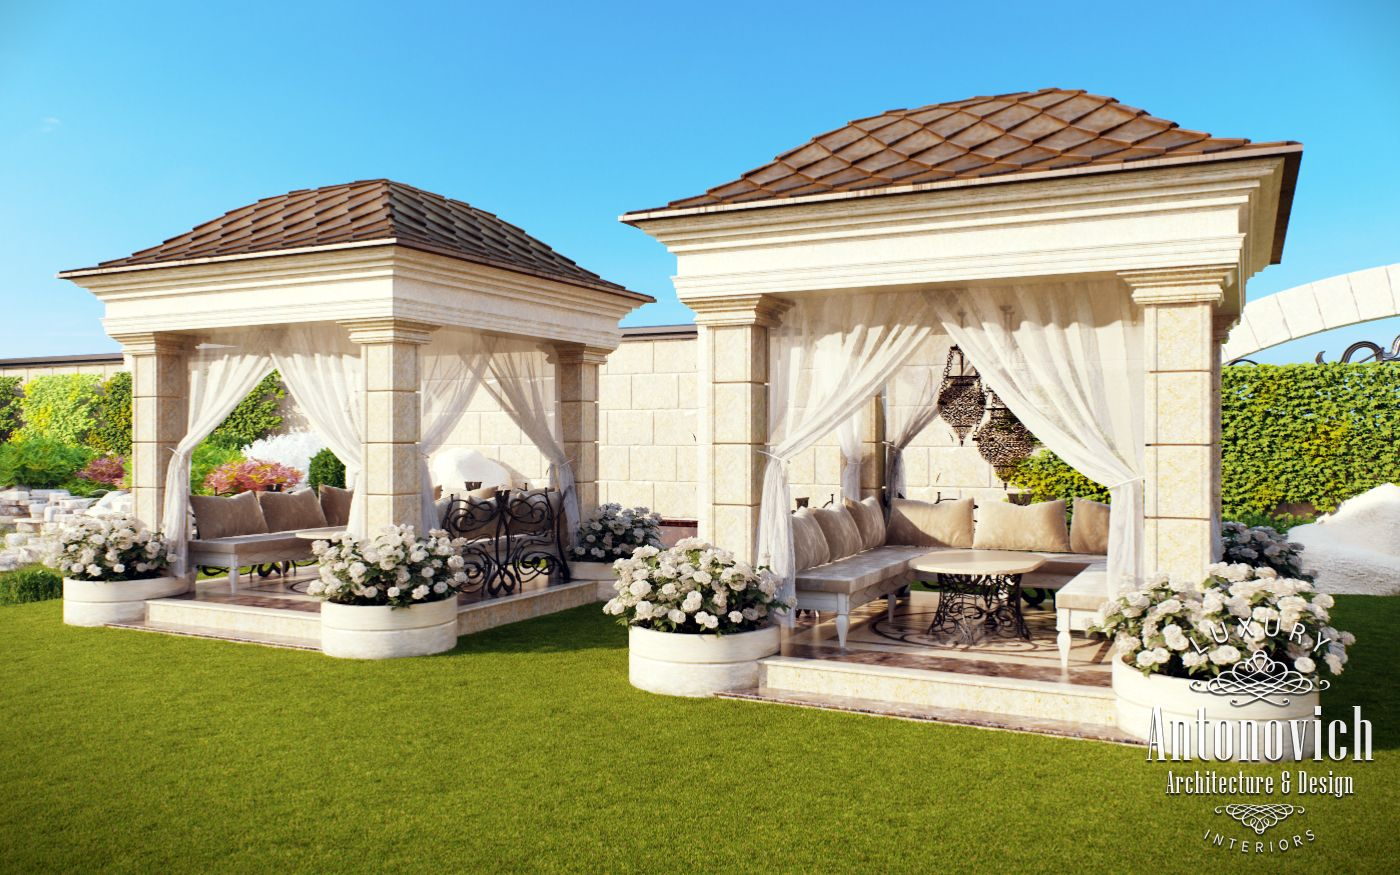 Kitchens dubai from antonovich design - Garden Landscaping Dubai From Luxury Antonovich Design